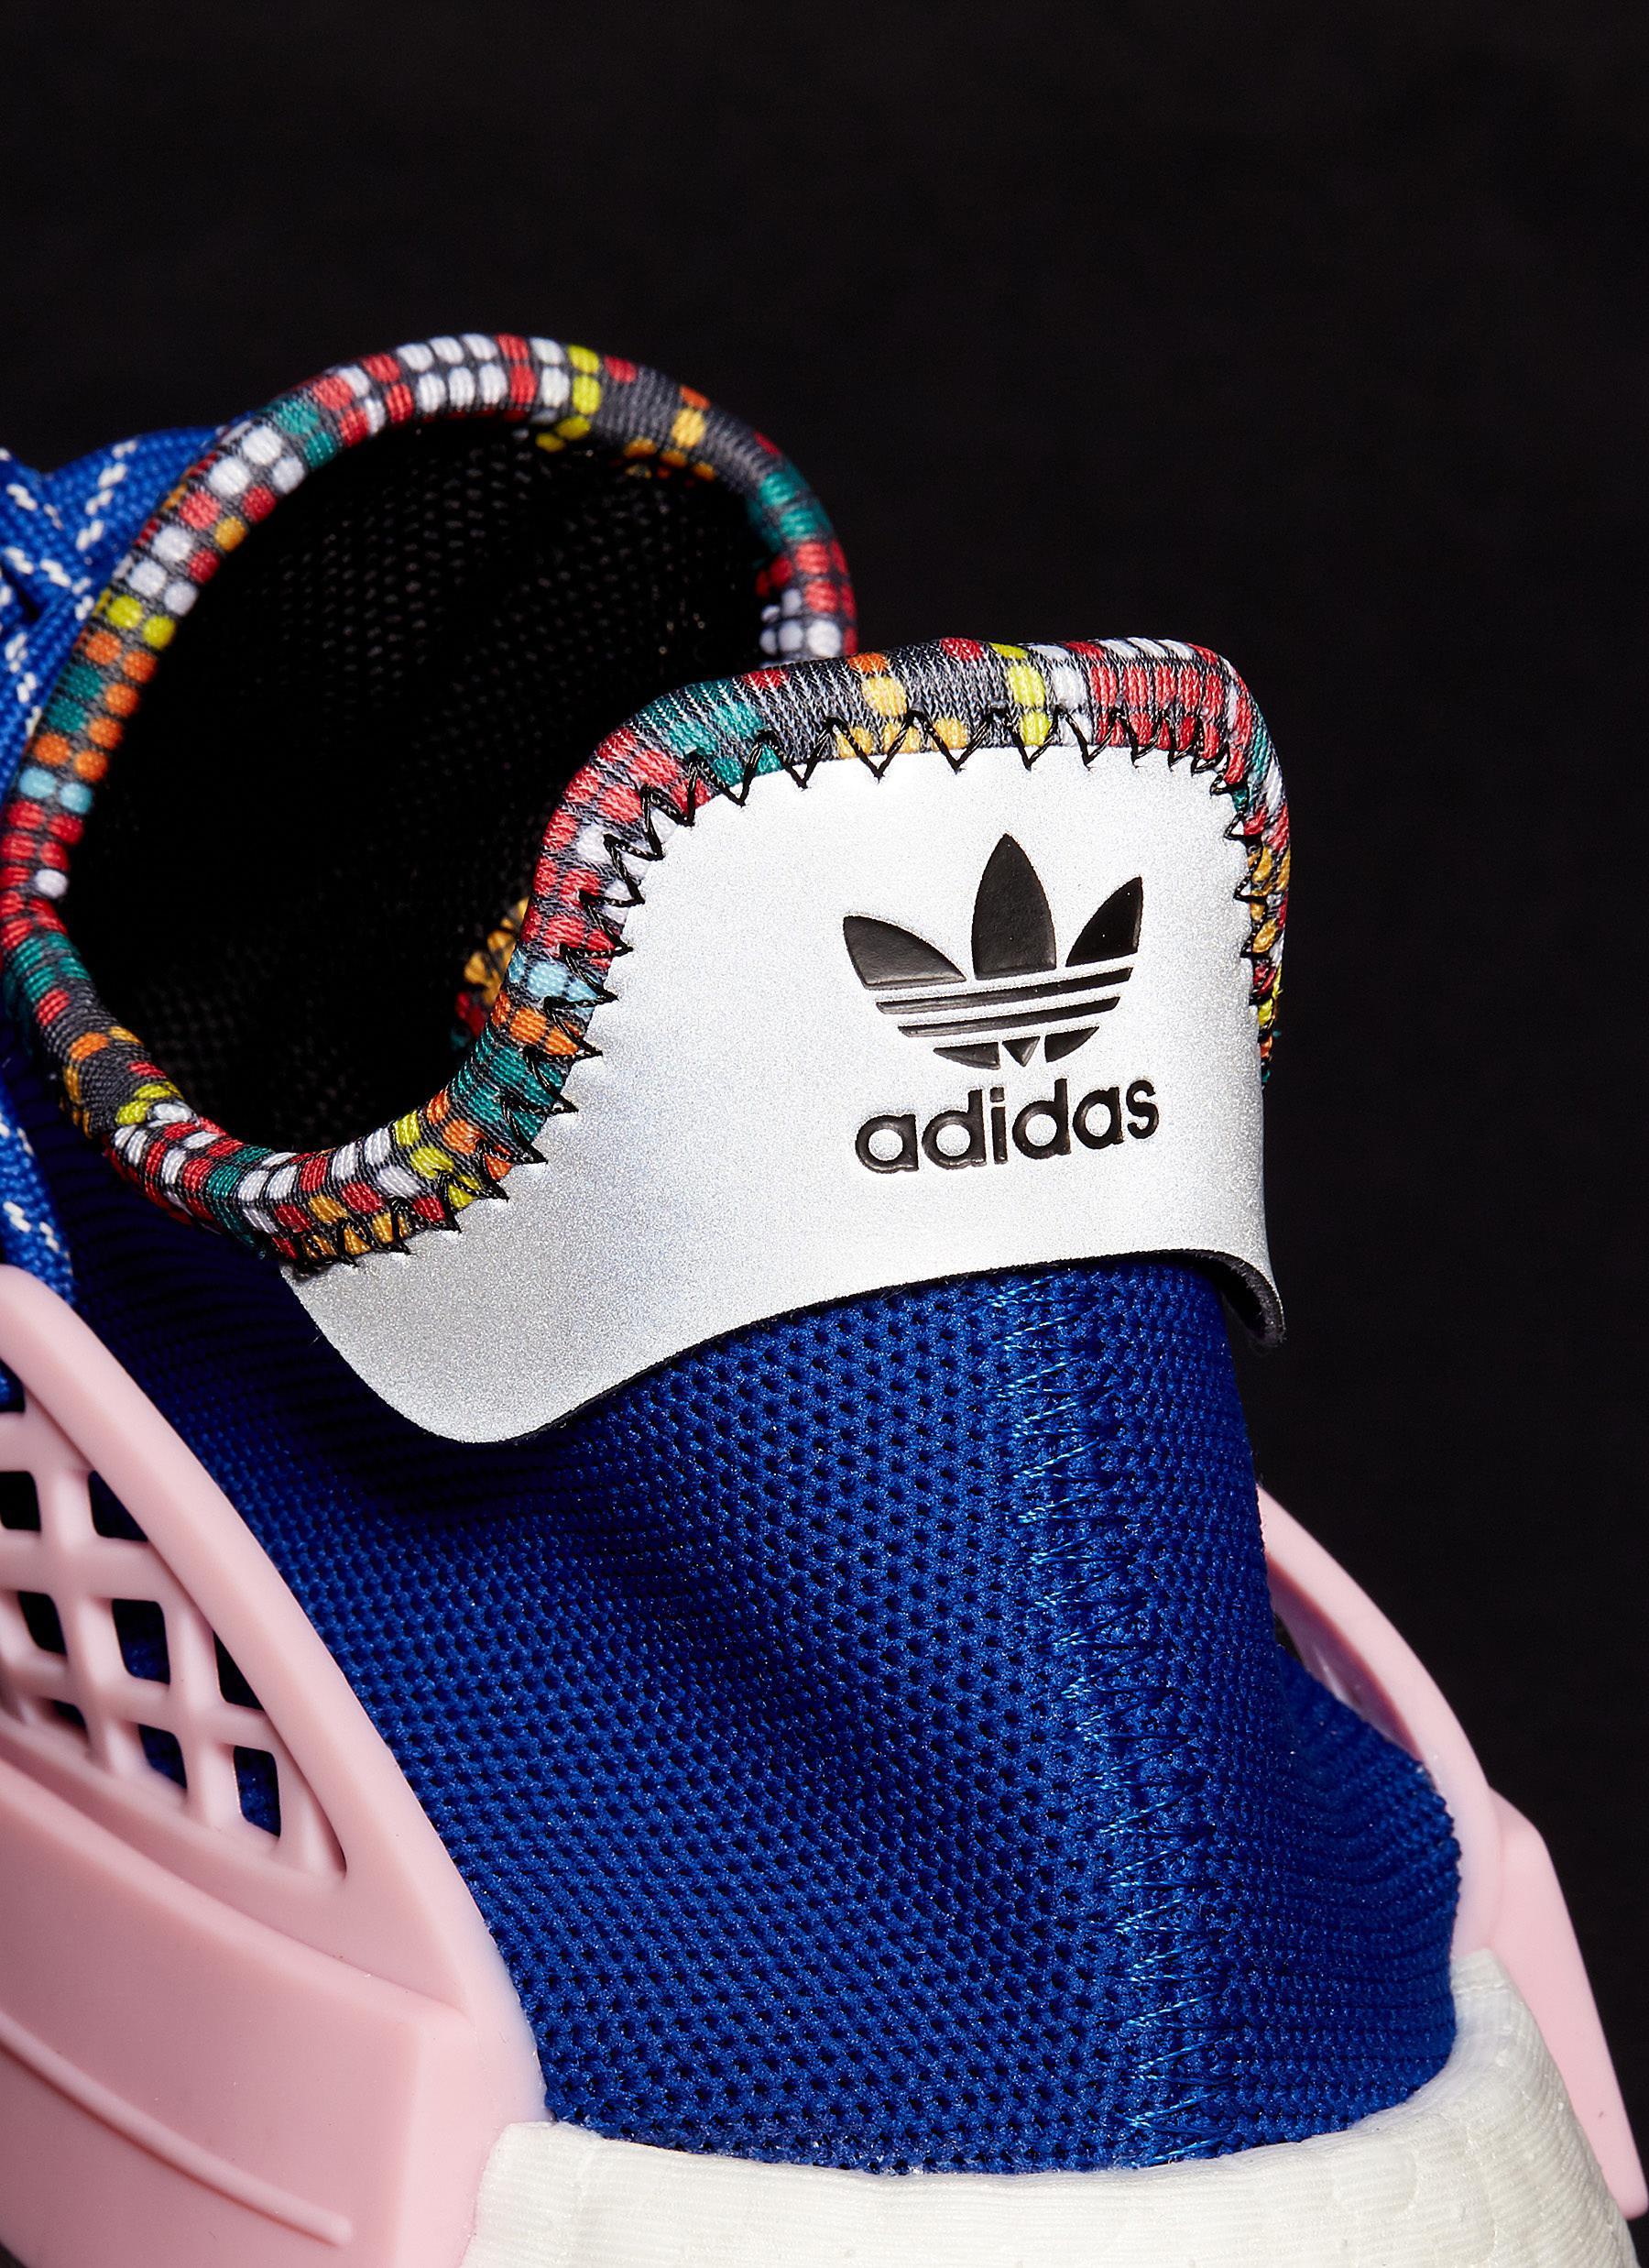 e12bb51579975 Adidas Originals - Blue  solarhu Nmd  Slogan Embroidered Primeknit Sneakers  for Men - Lyst. View fullscreen